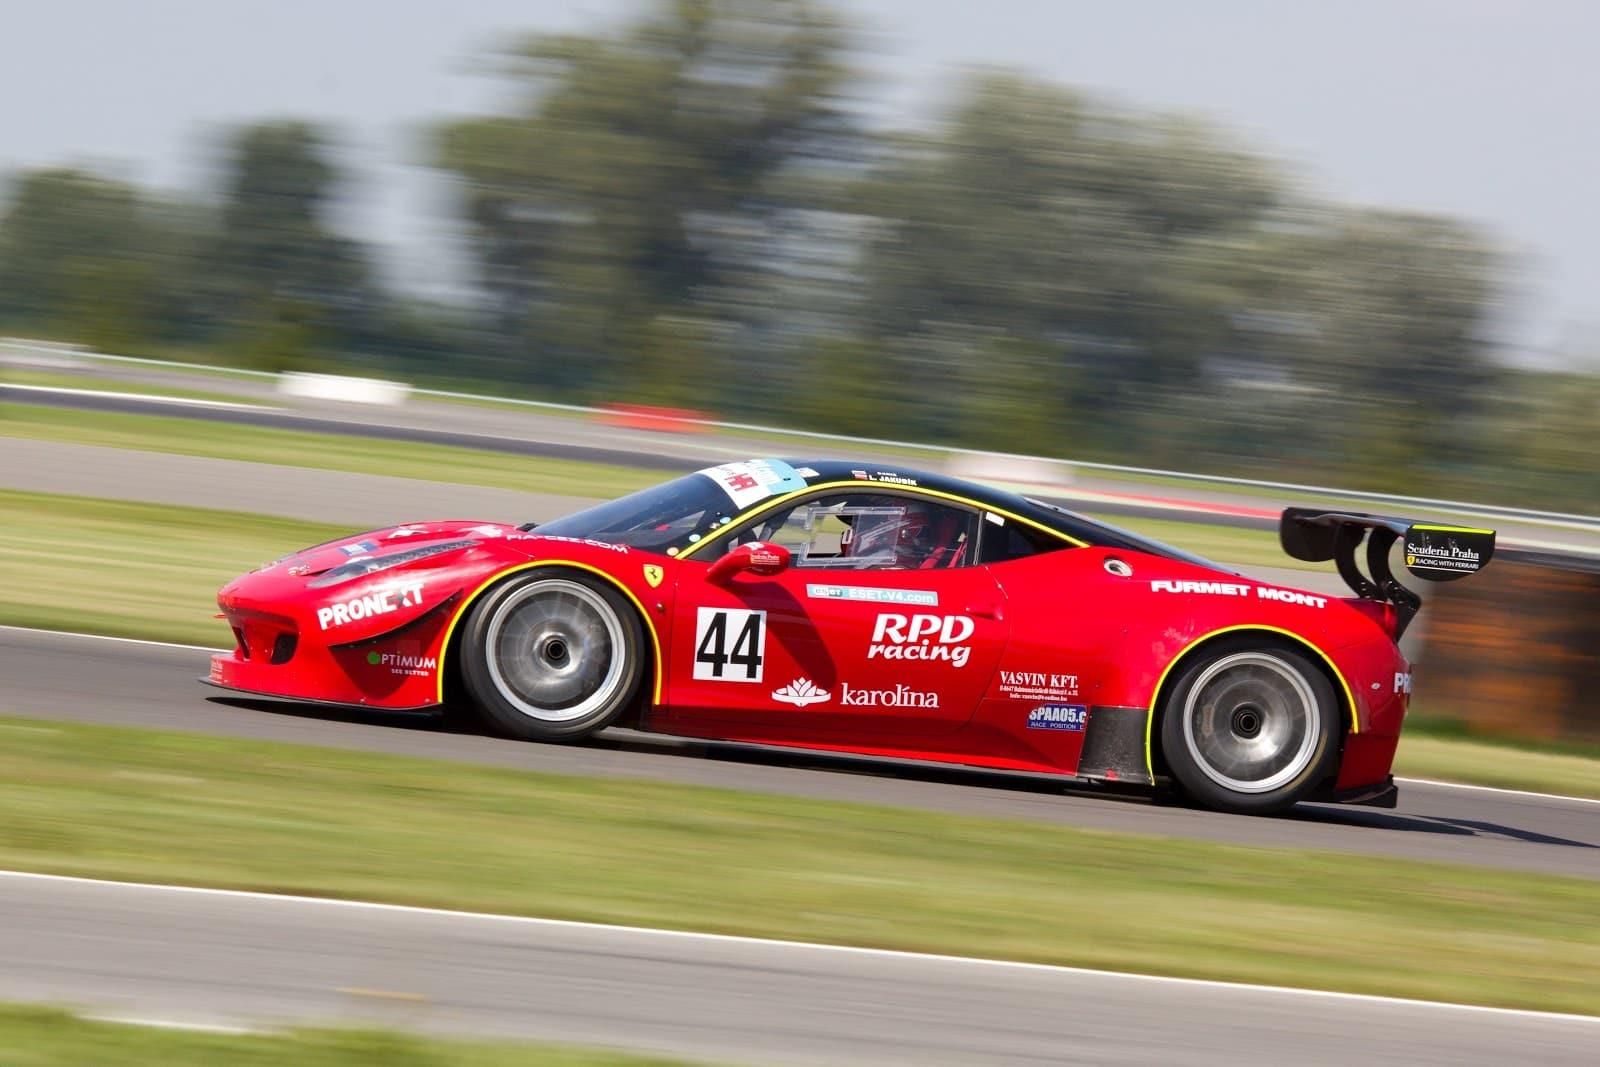 auto racing car championship 158971